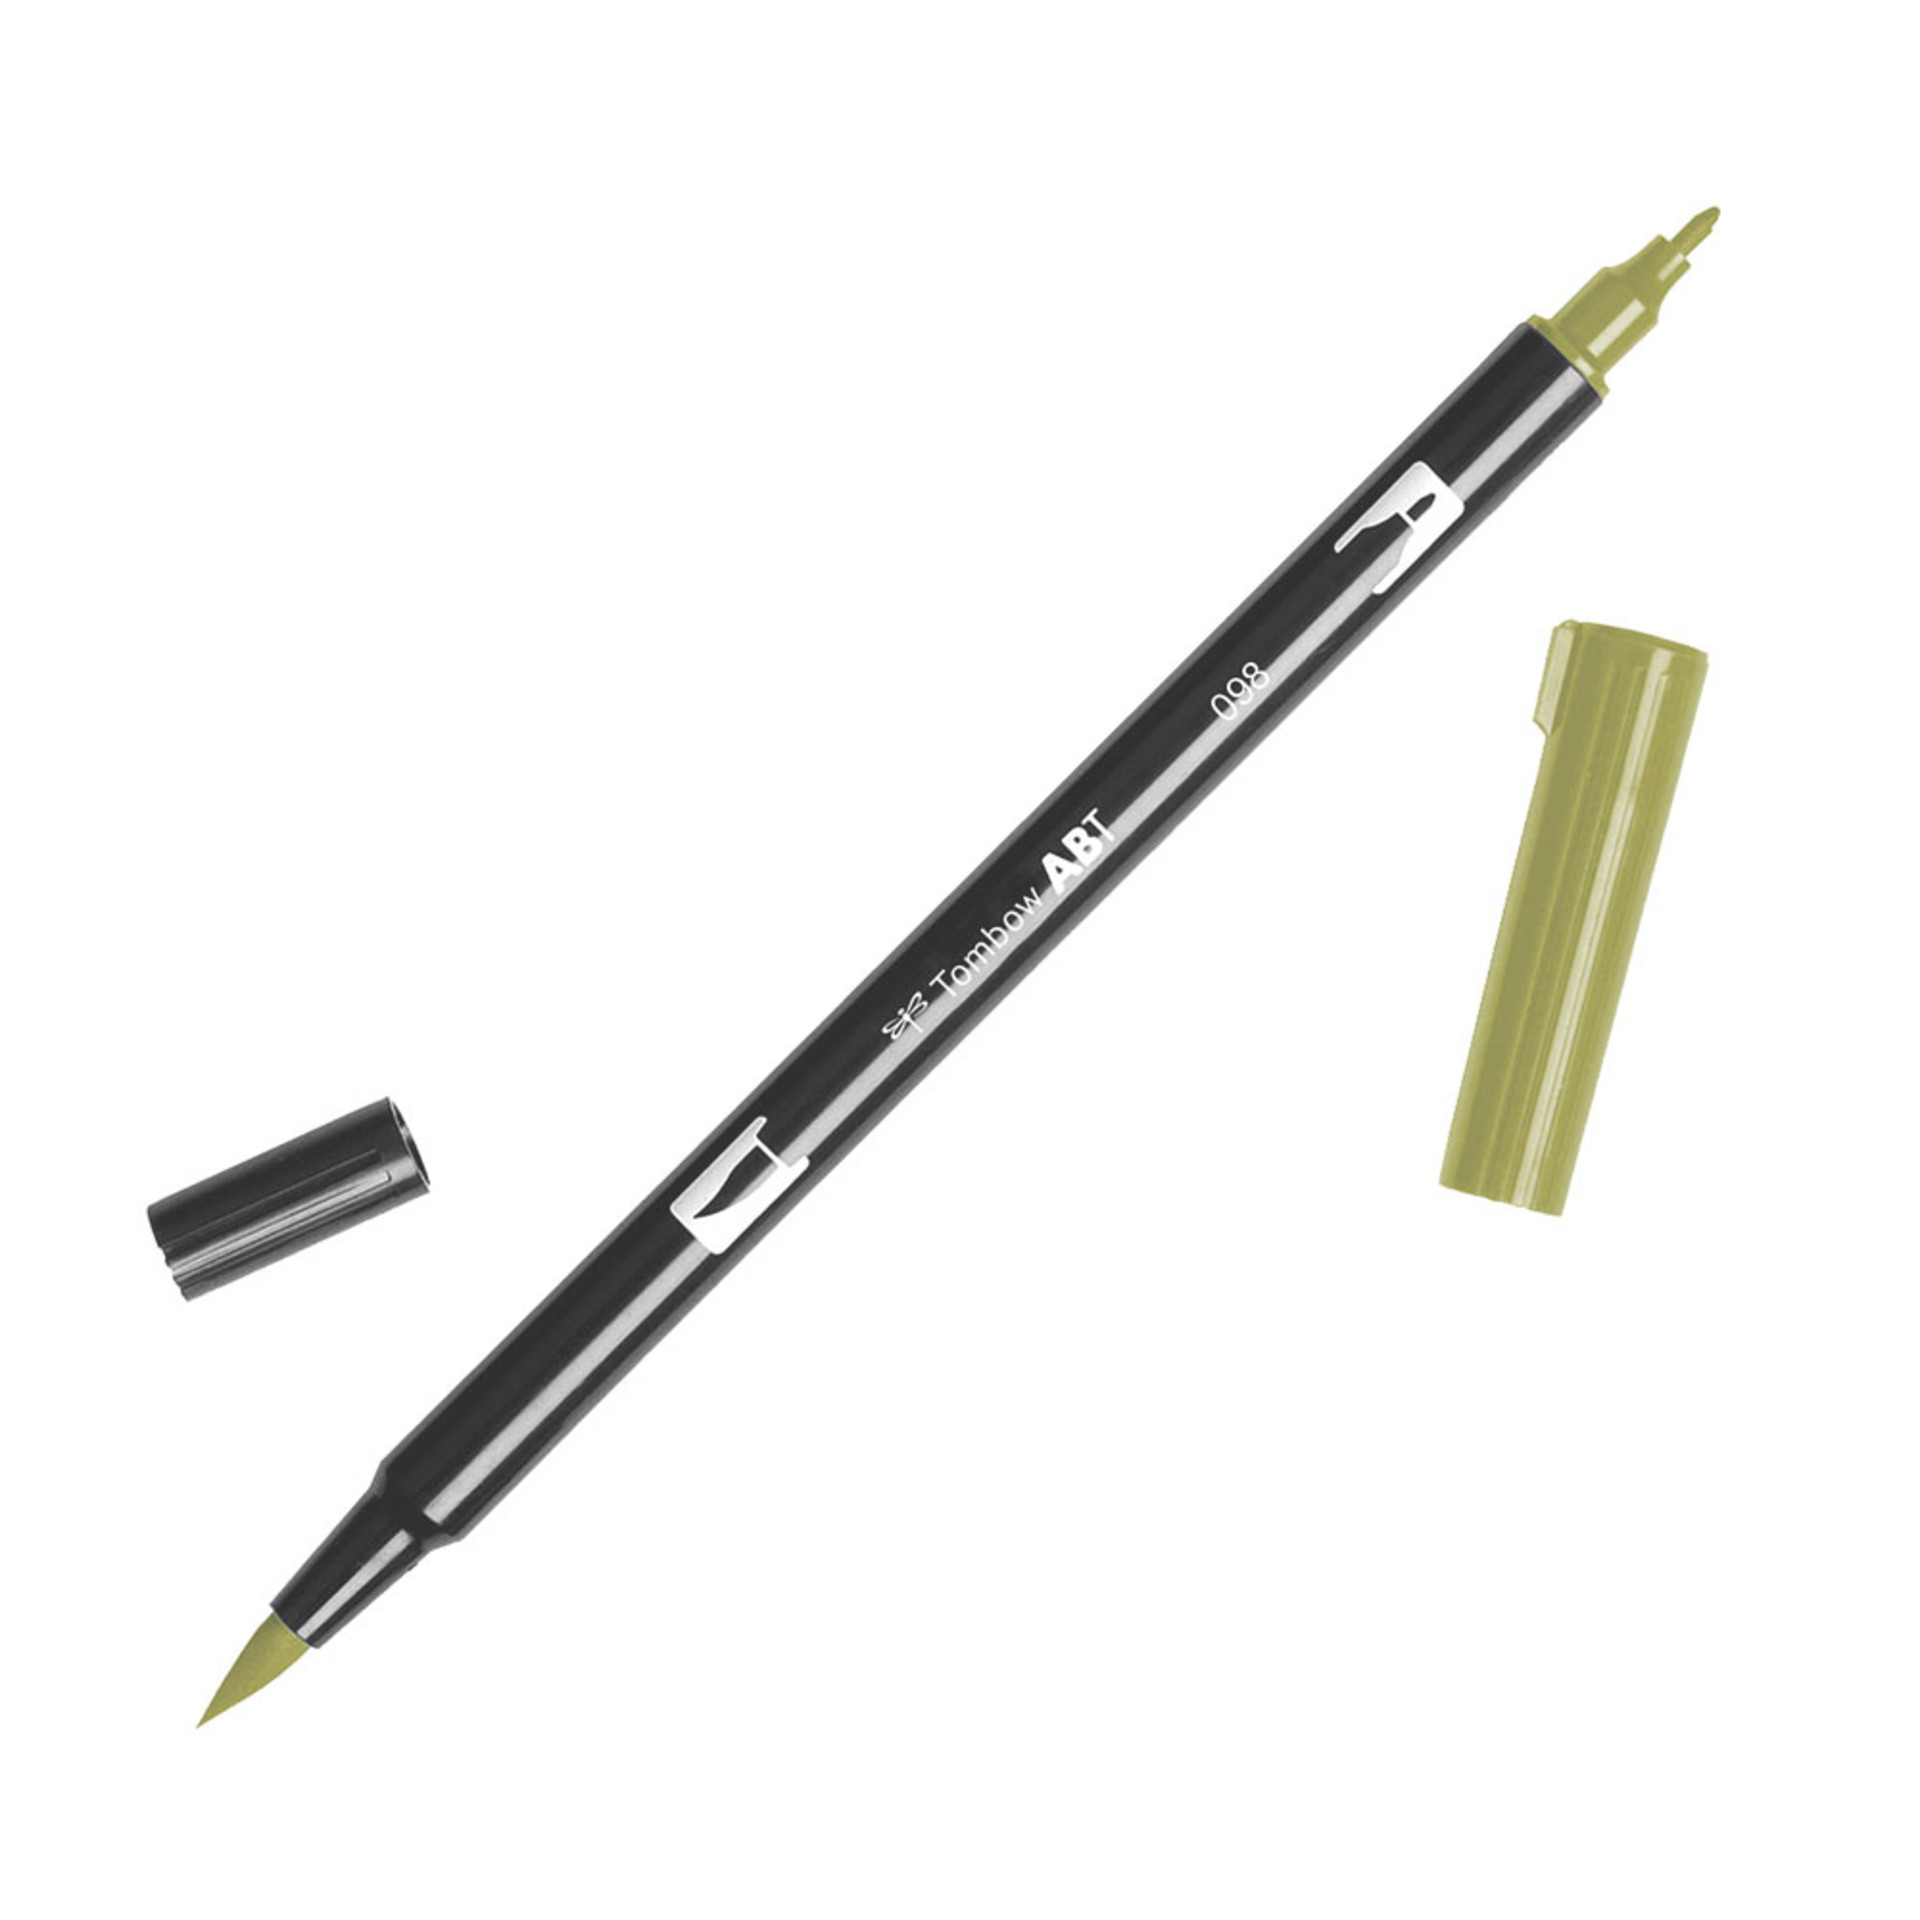 Tombow Dual-Tip Brush Marker Pen – Avocado